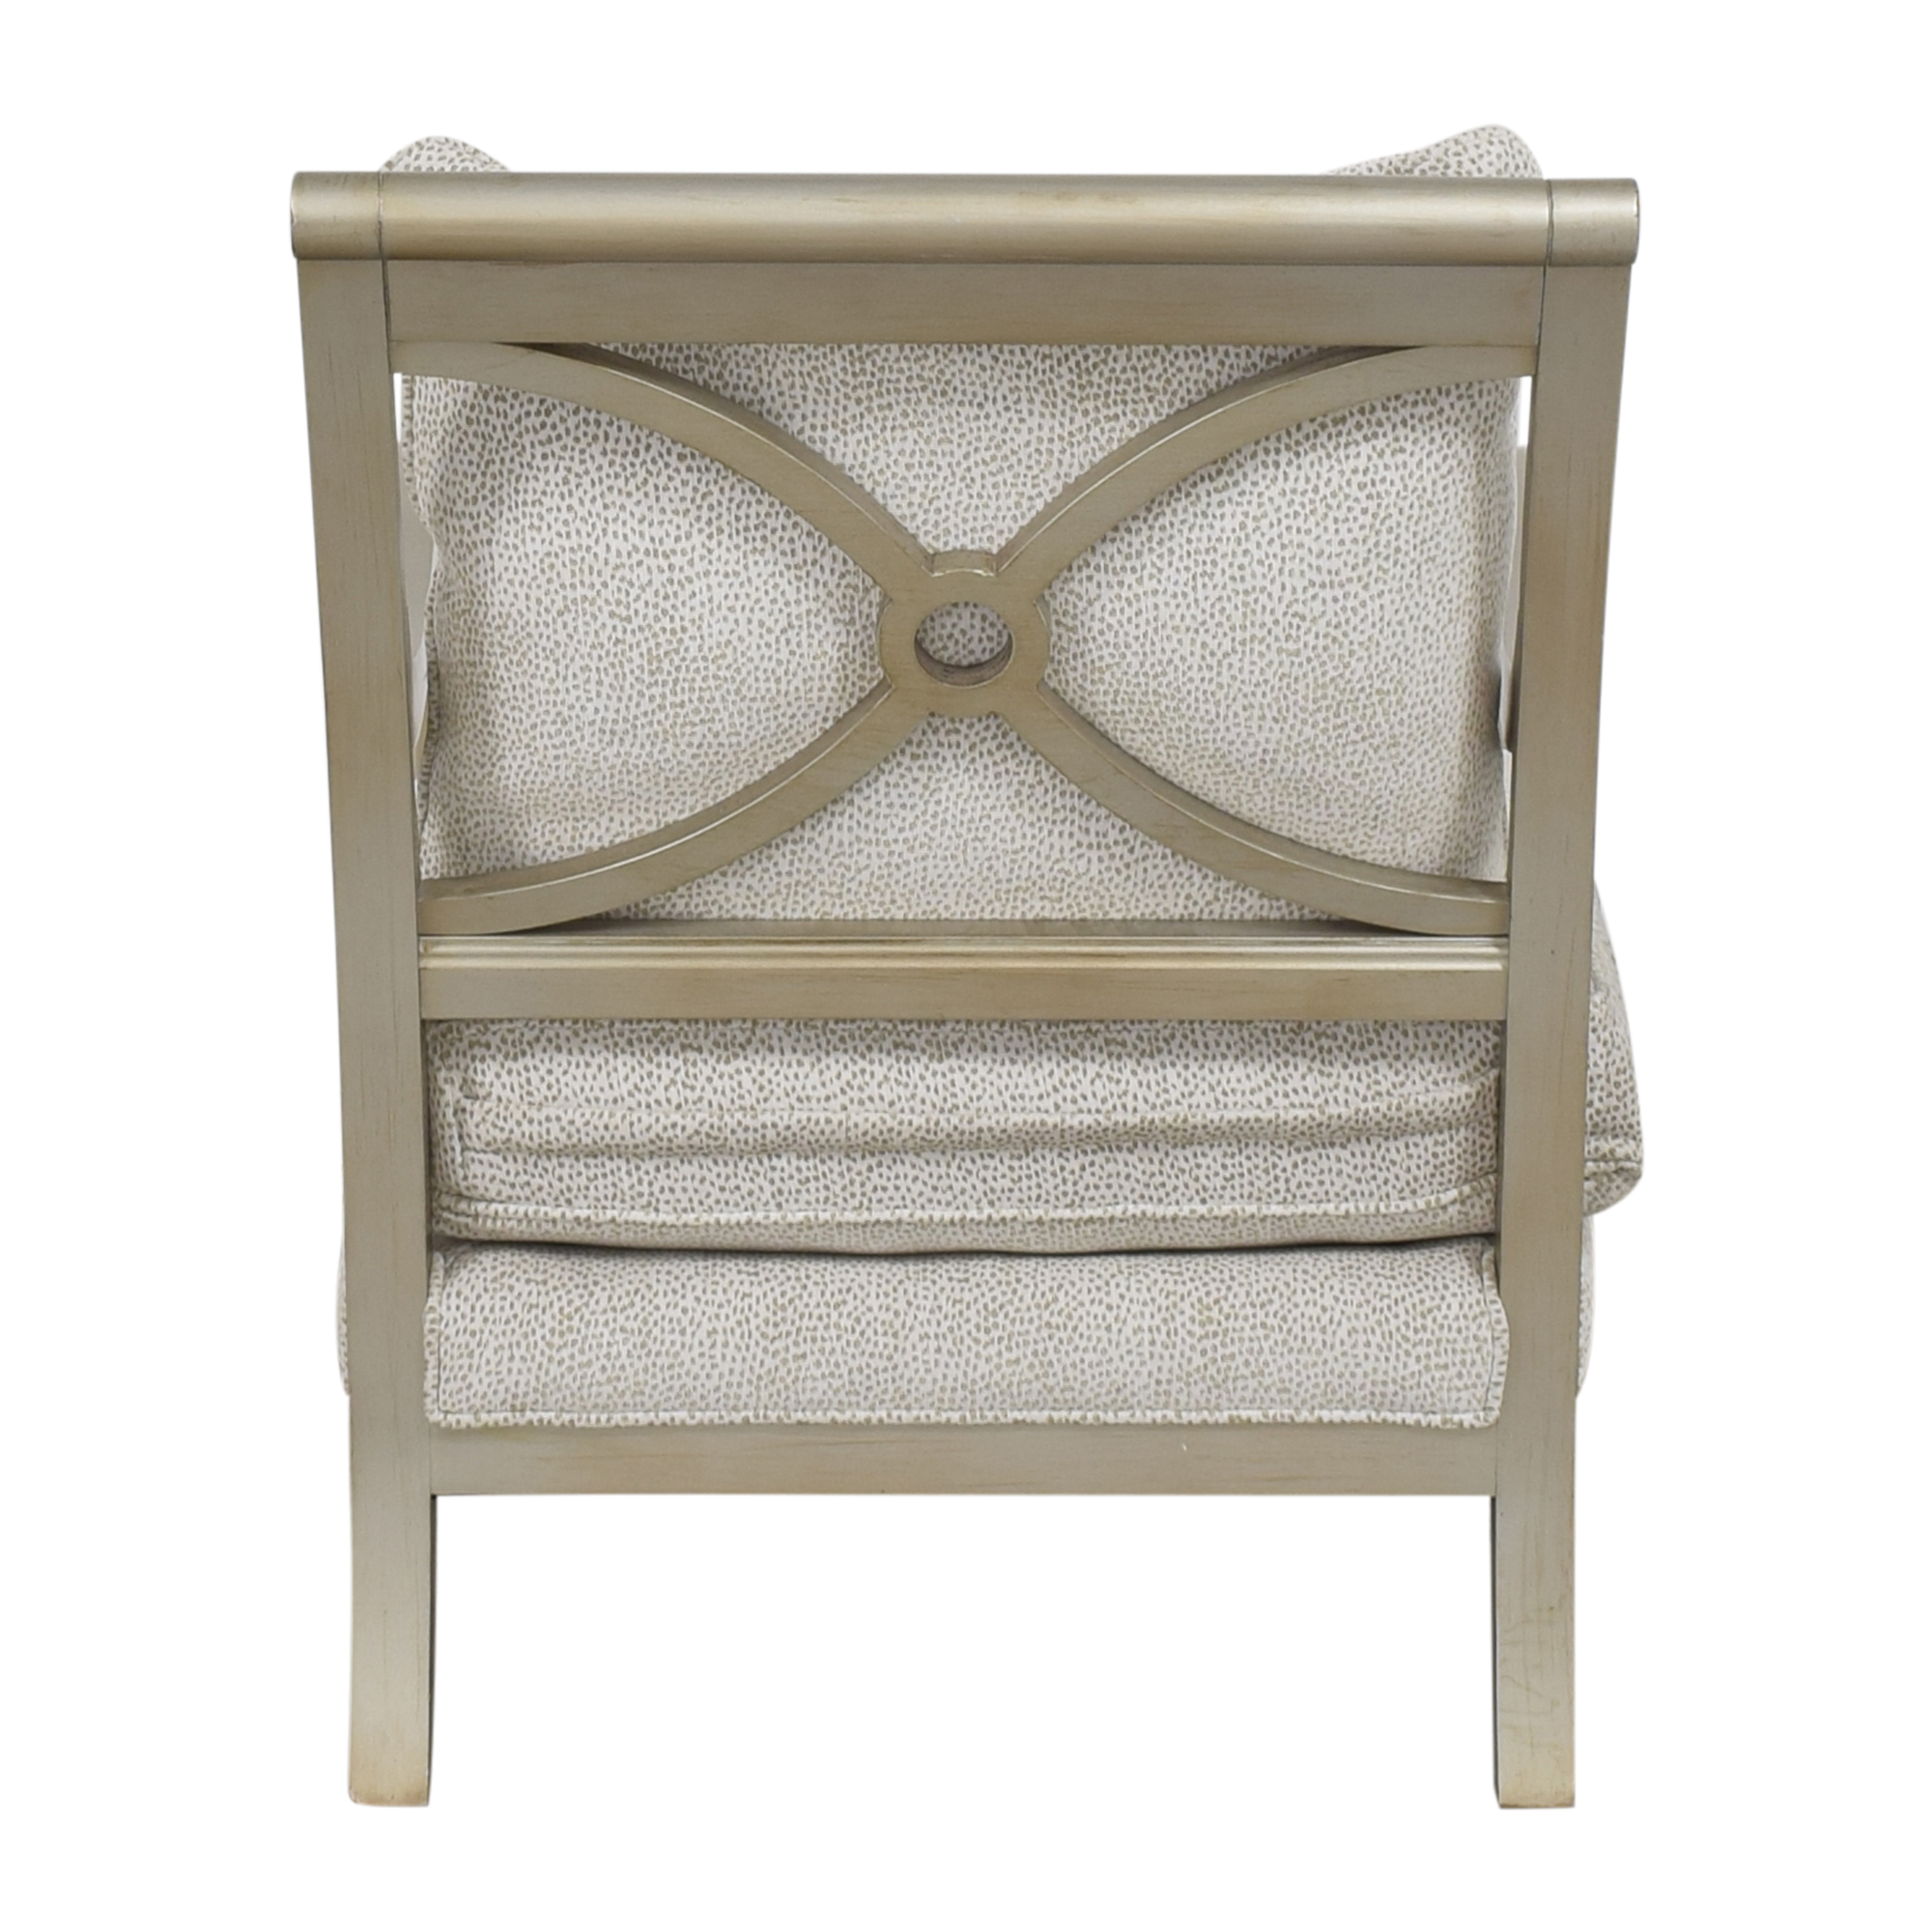 shop Vanguard Furniture Modern Accent Chair Vanguard Furniture Chairs